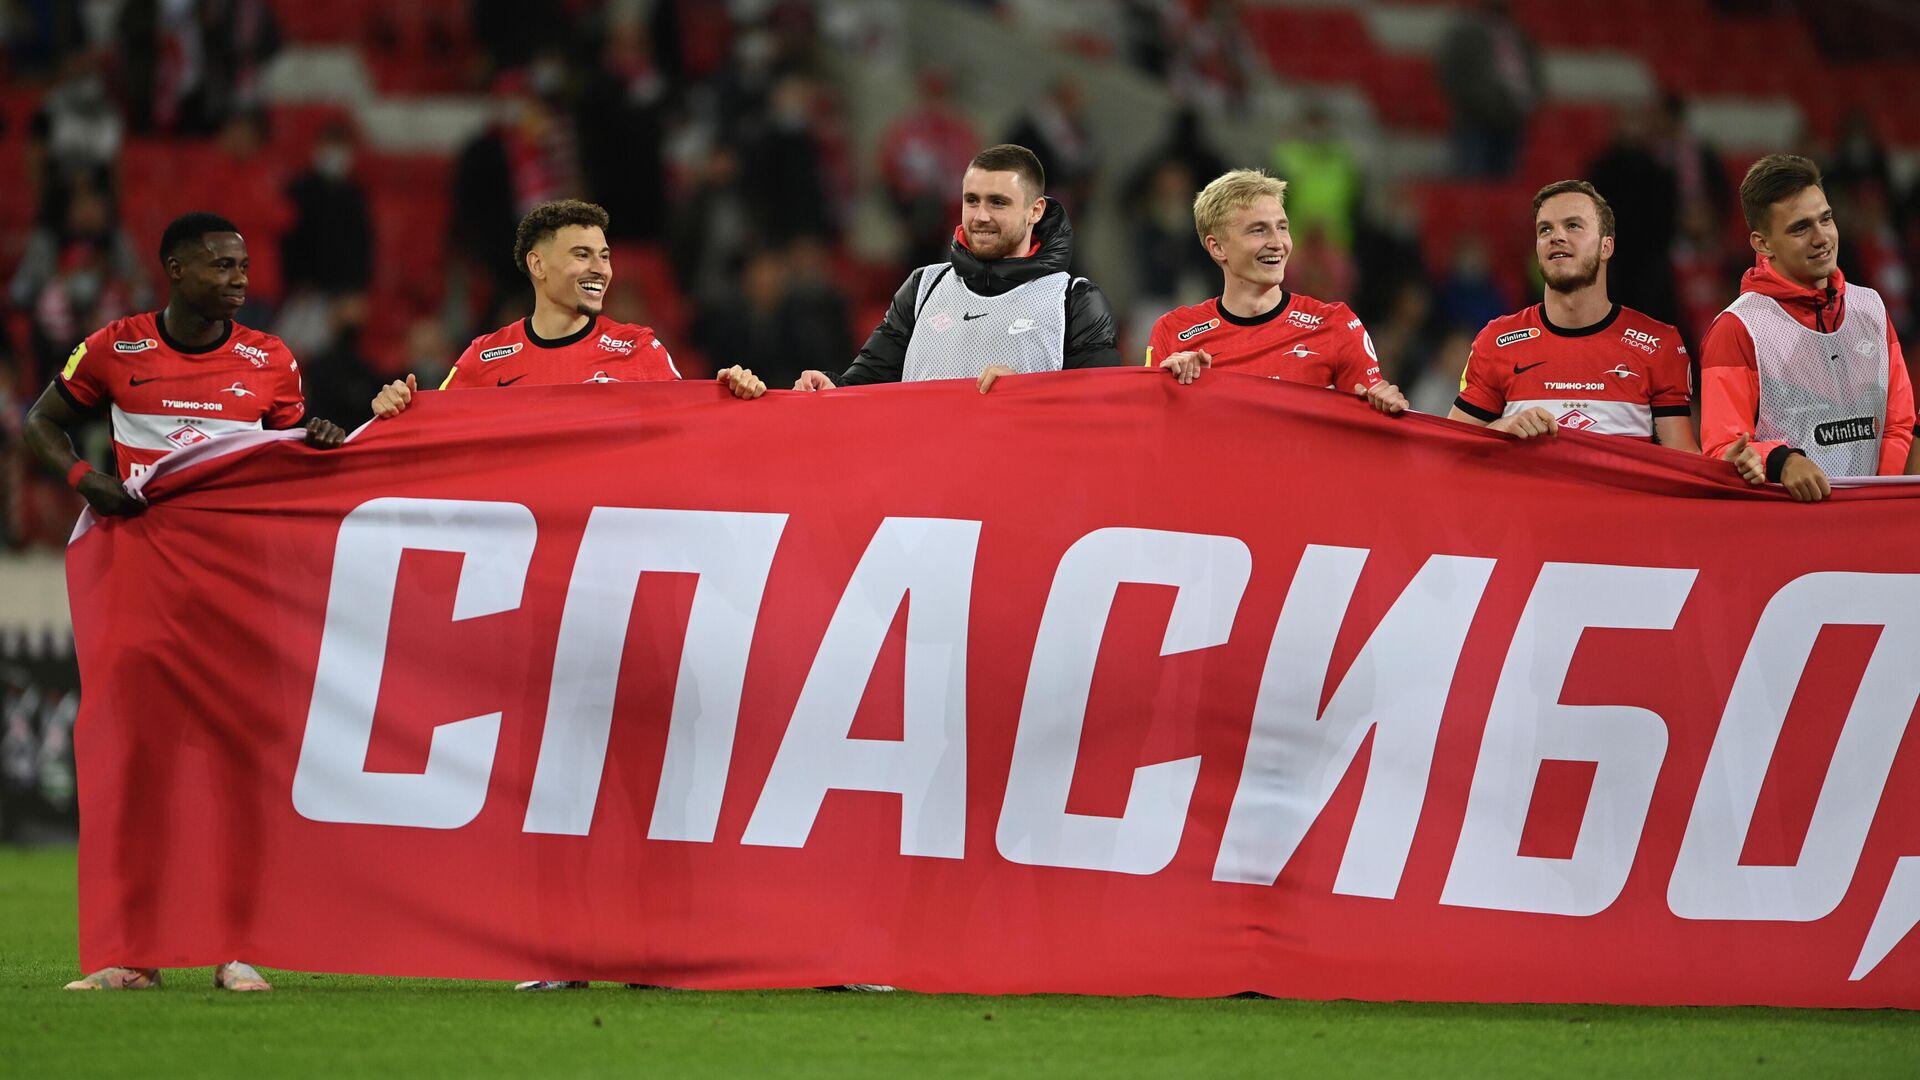 Футболисты Спартака - РИА Новости, 1920, 16.05.2021